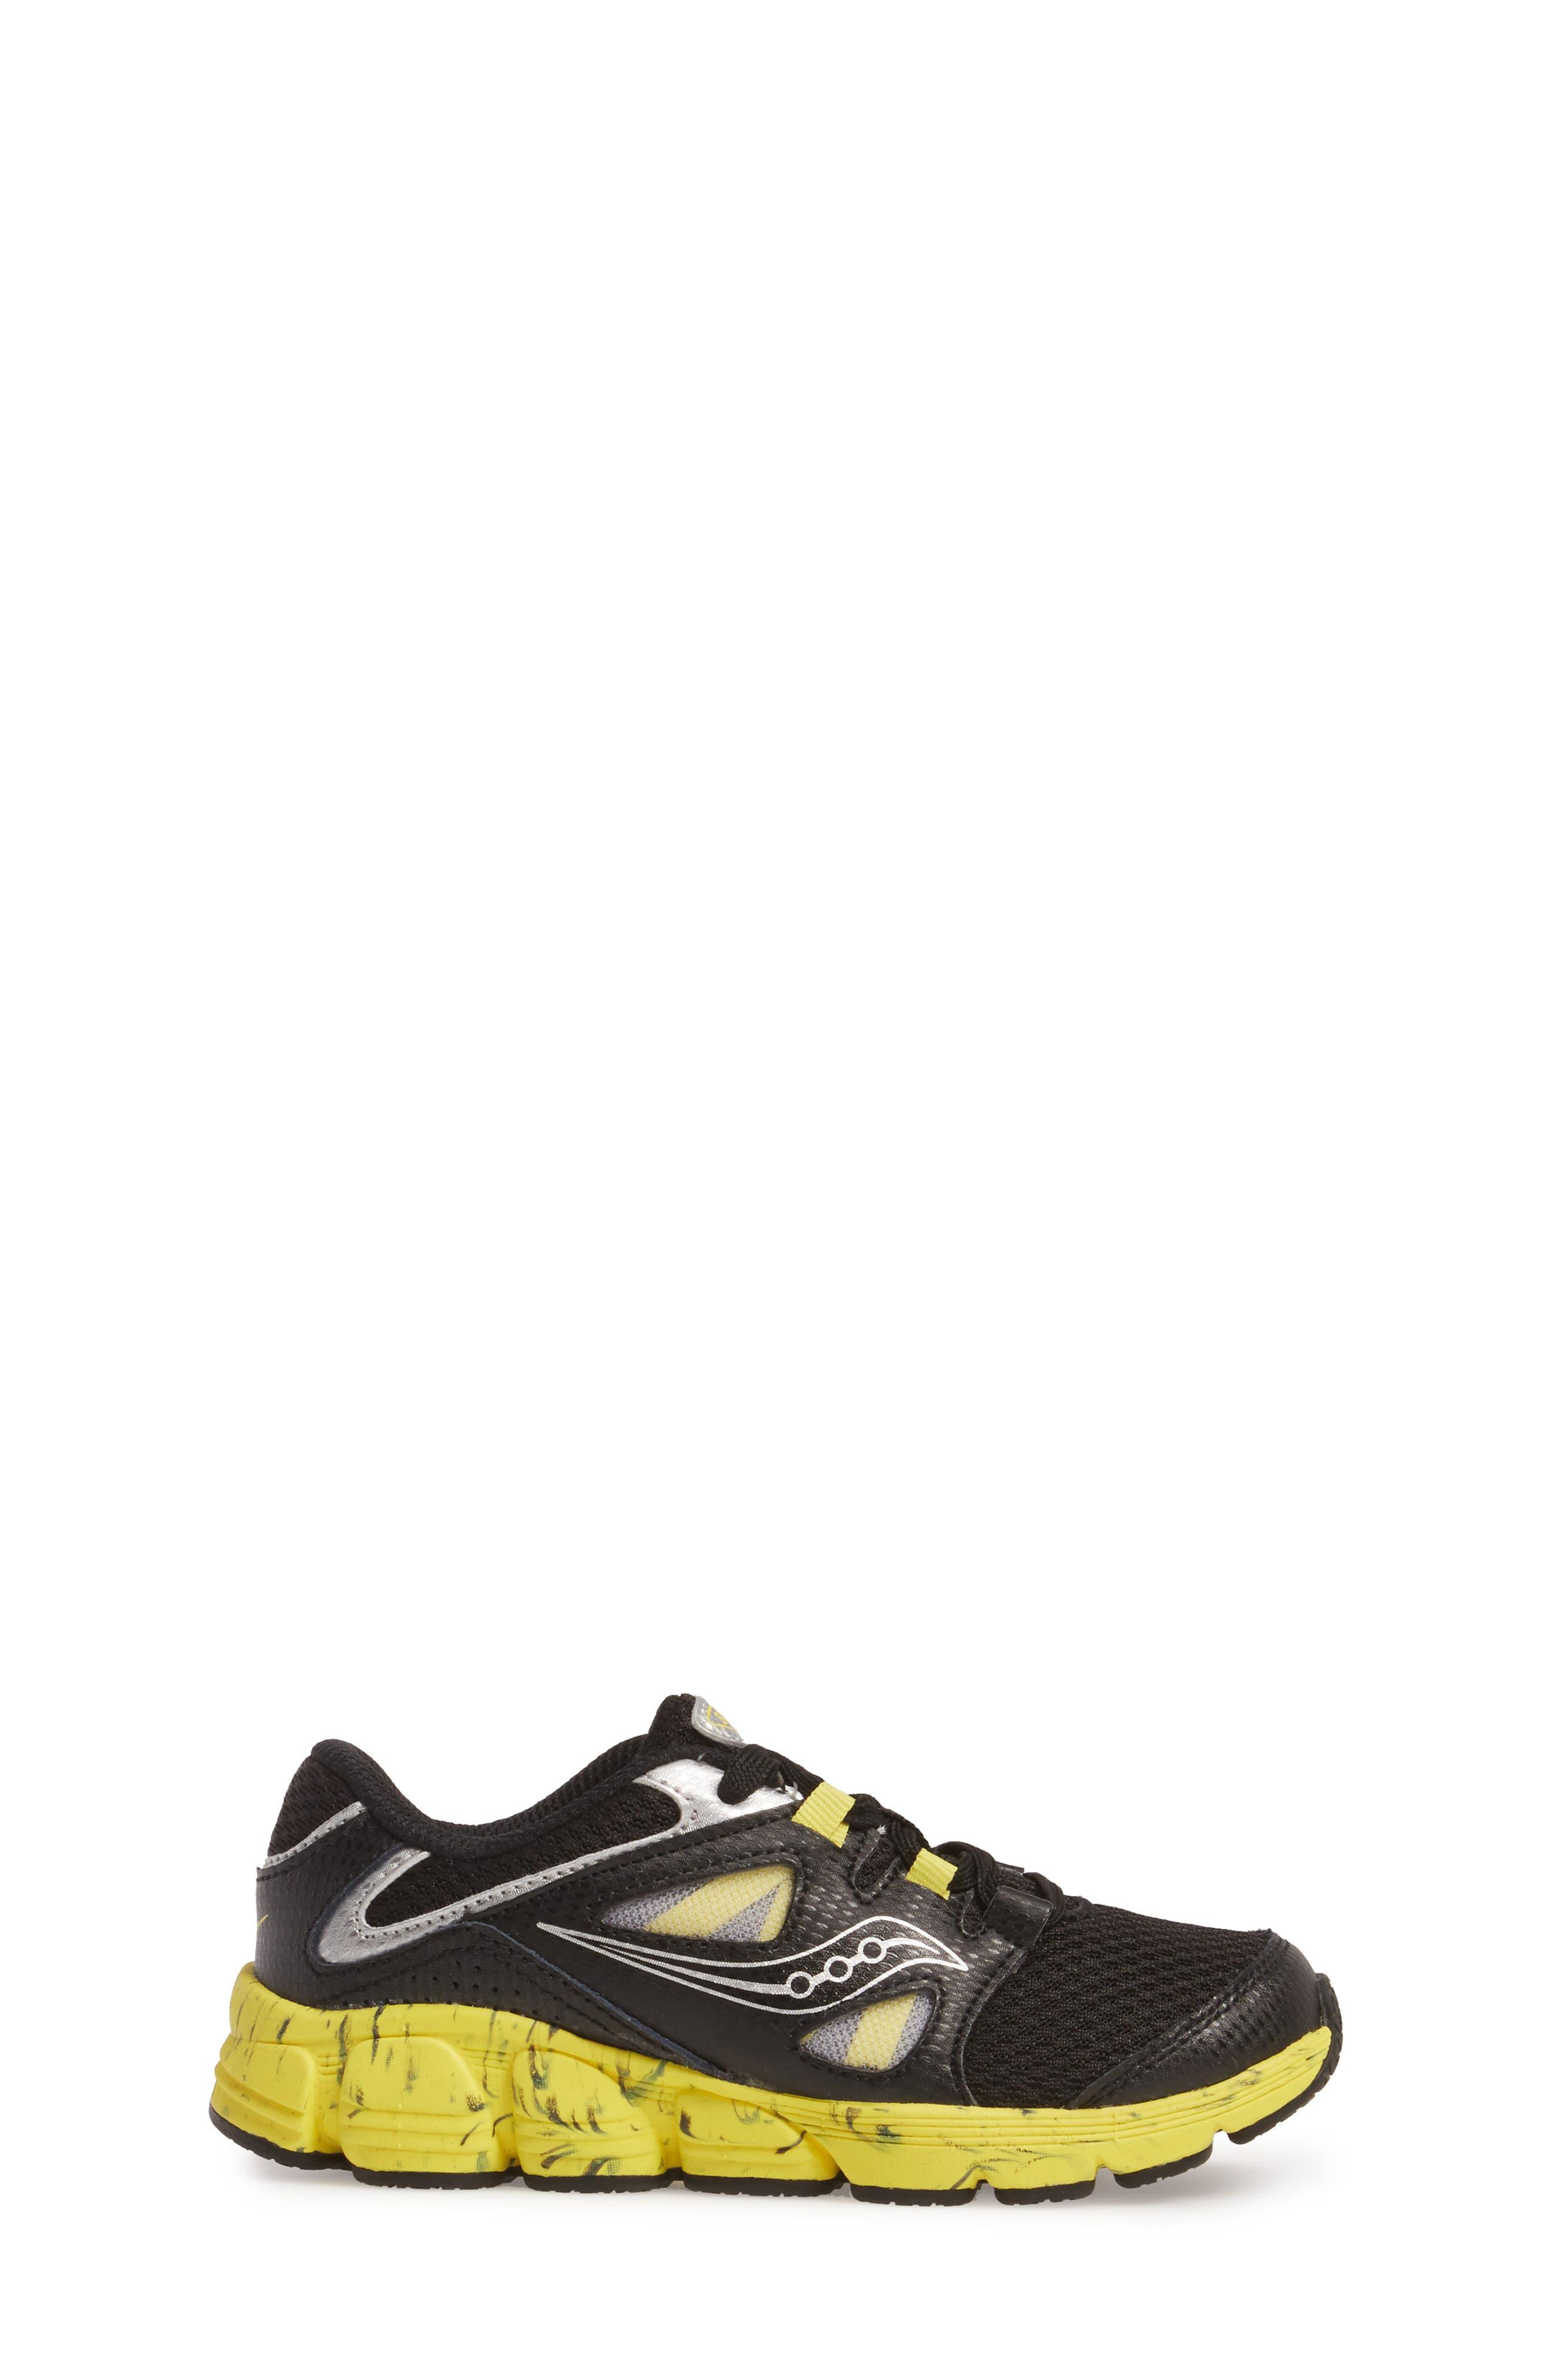 Kotaro 4 Sneaker,                             Alternate thumbnail 3, color,                             001